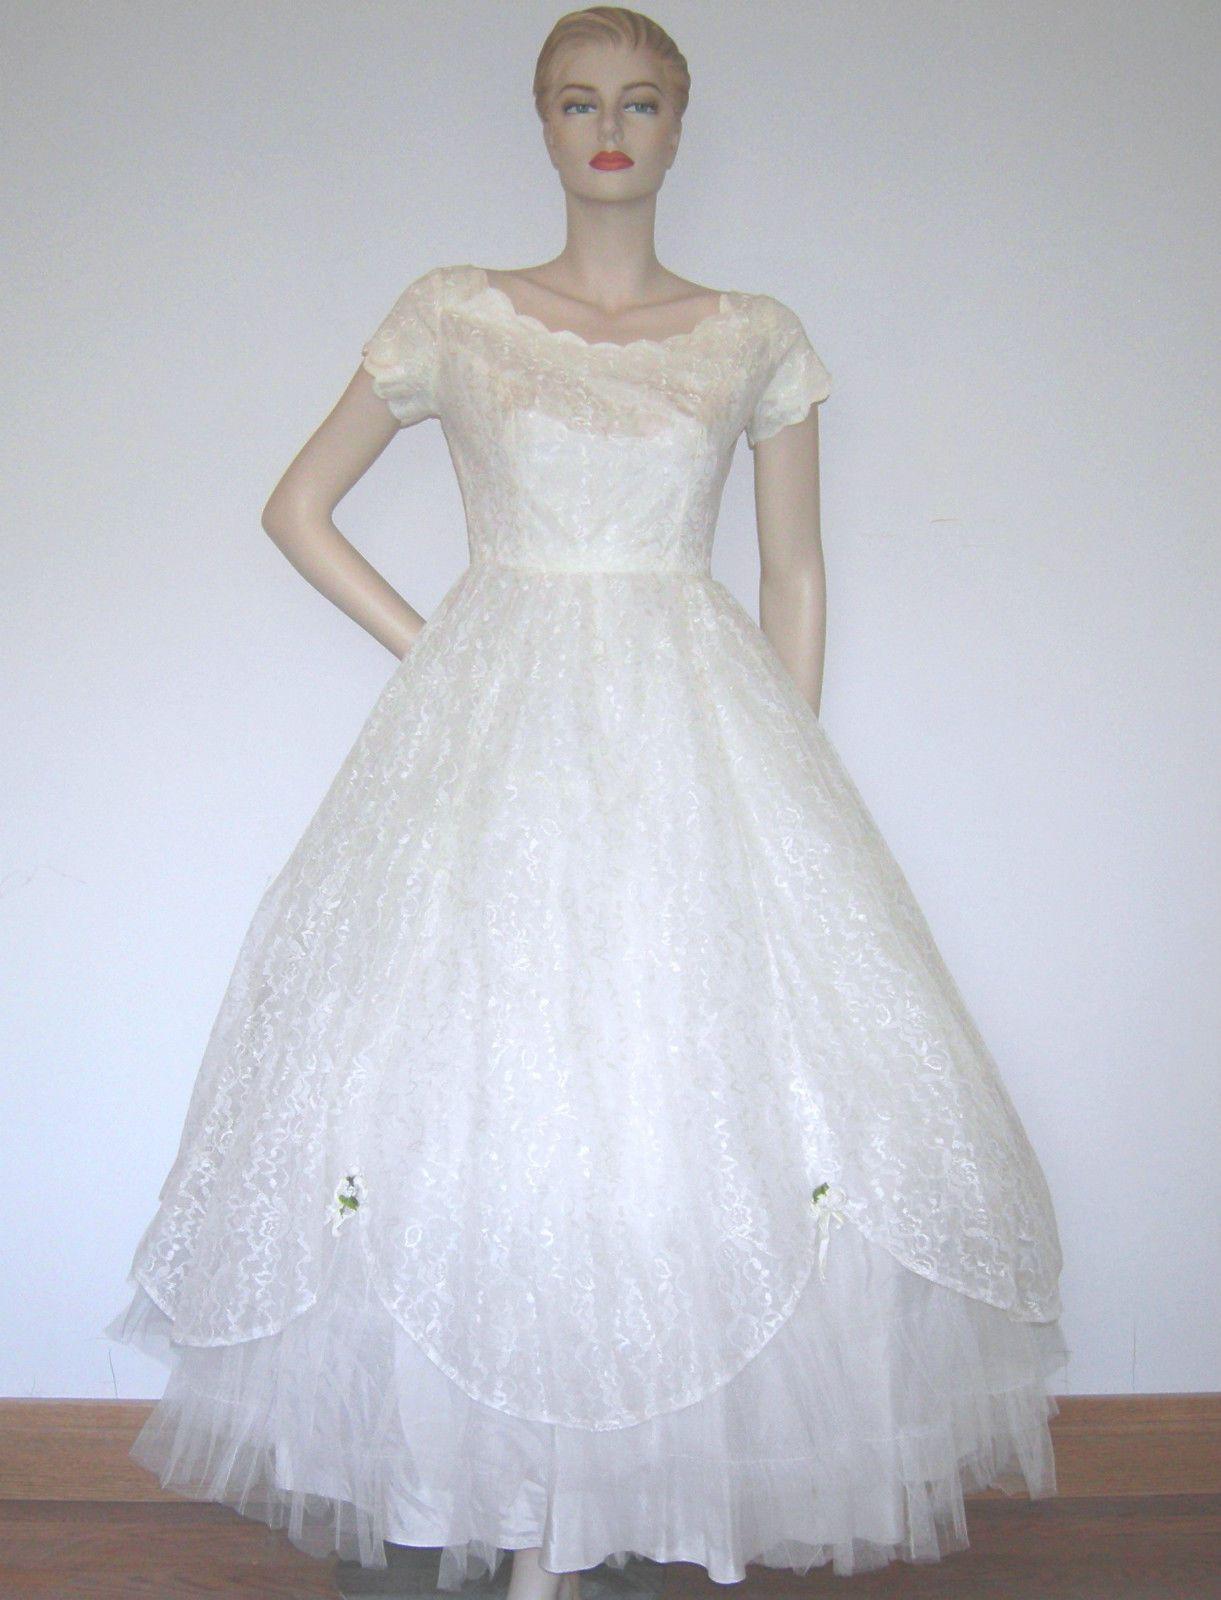 Ksl wedding dress  Vintage Party Dresses  Fashion  Pinterest